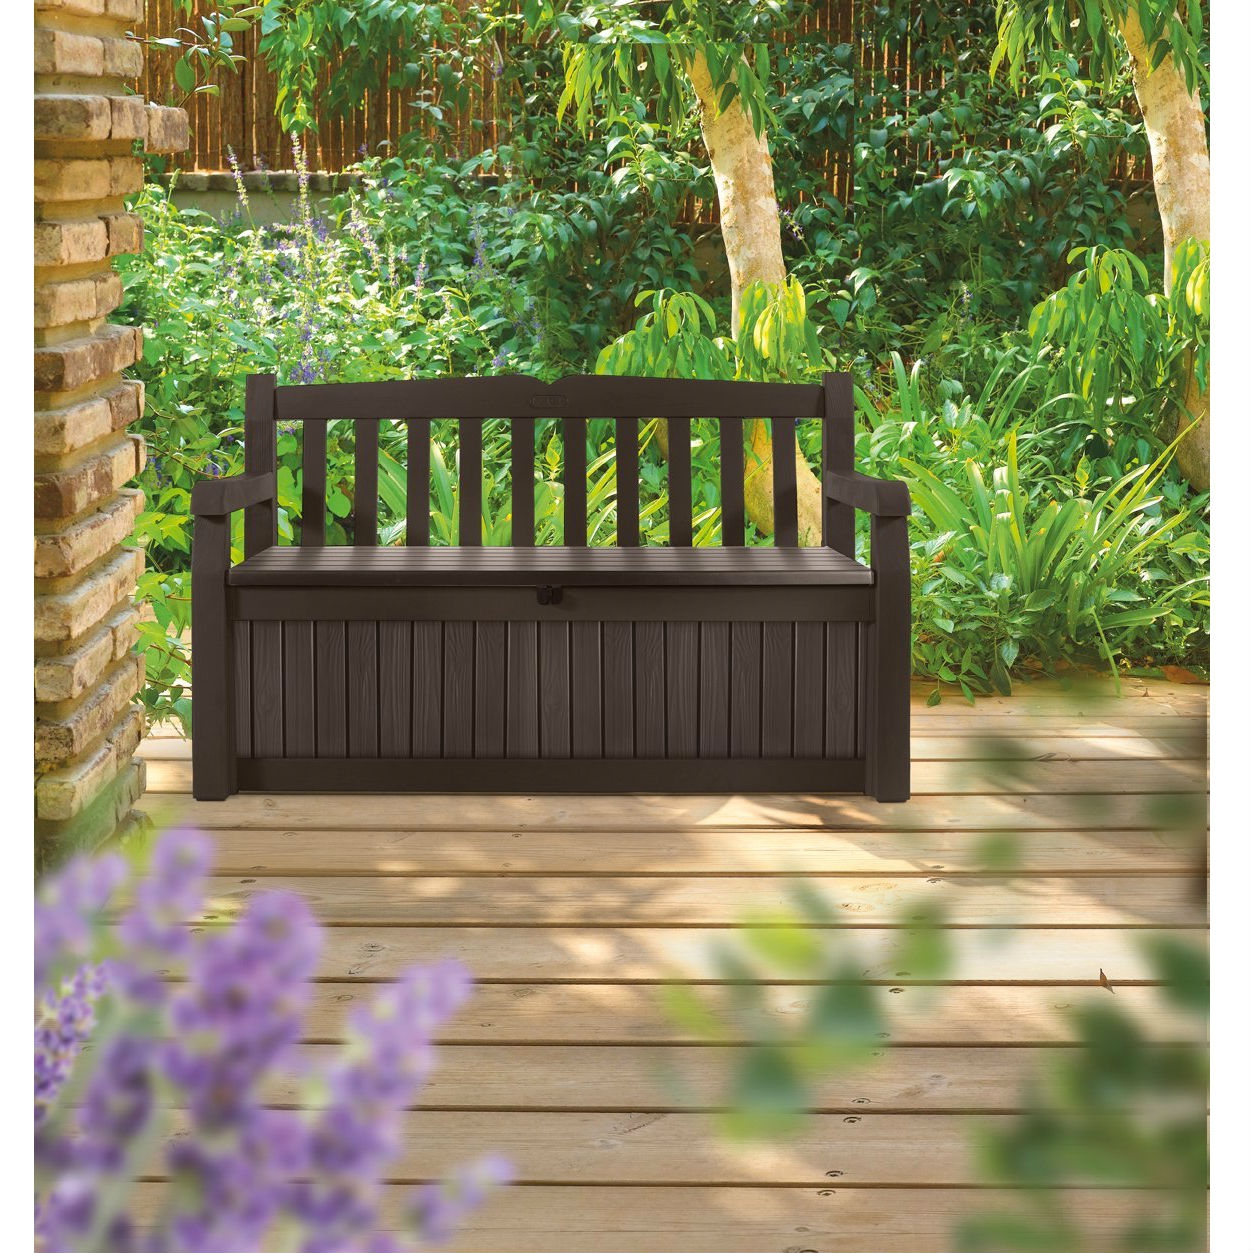 Brown Resin Outdoor Patio Garden Bench with Storage Box